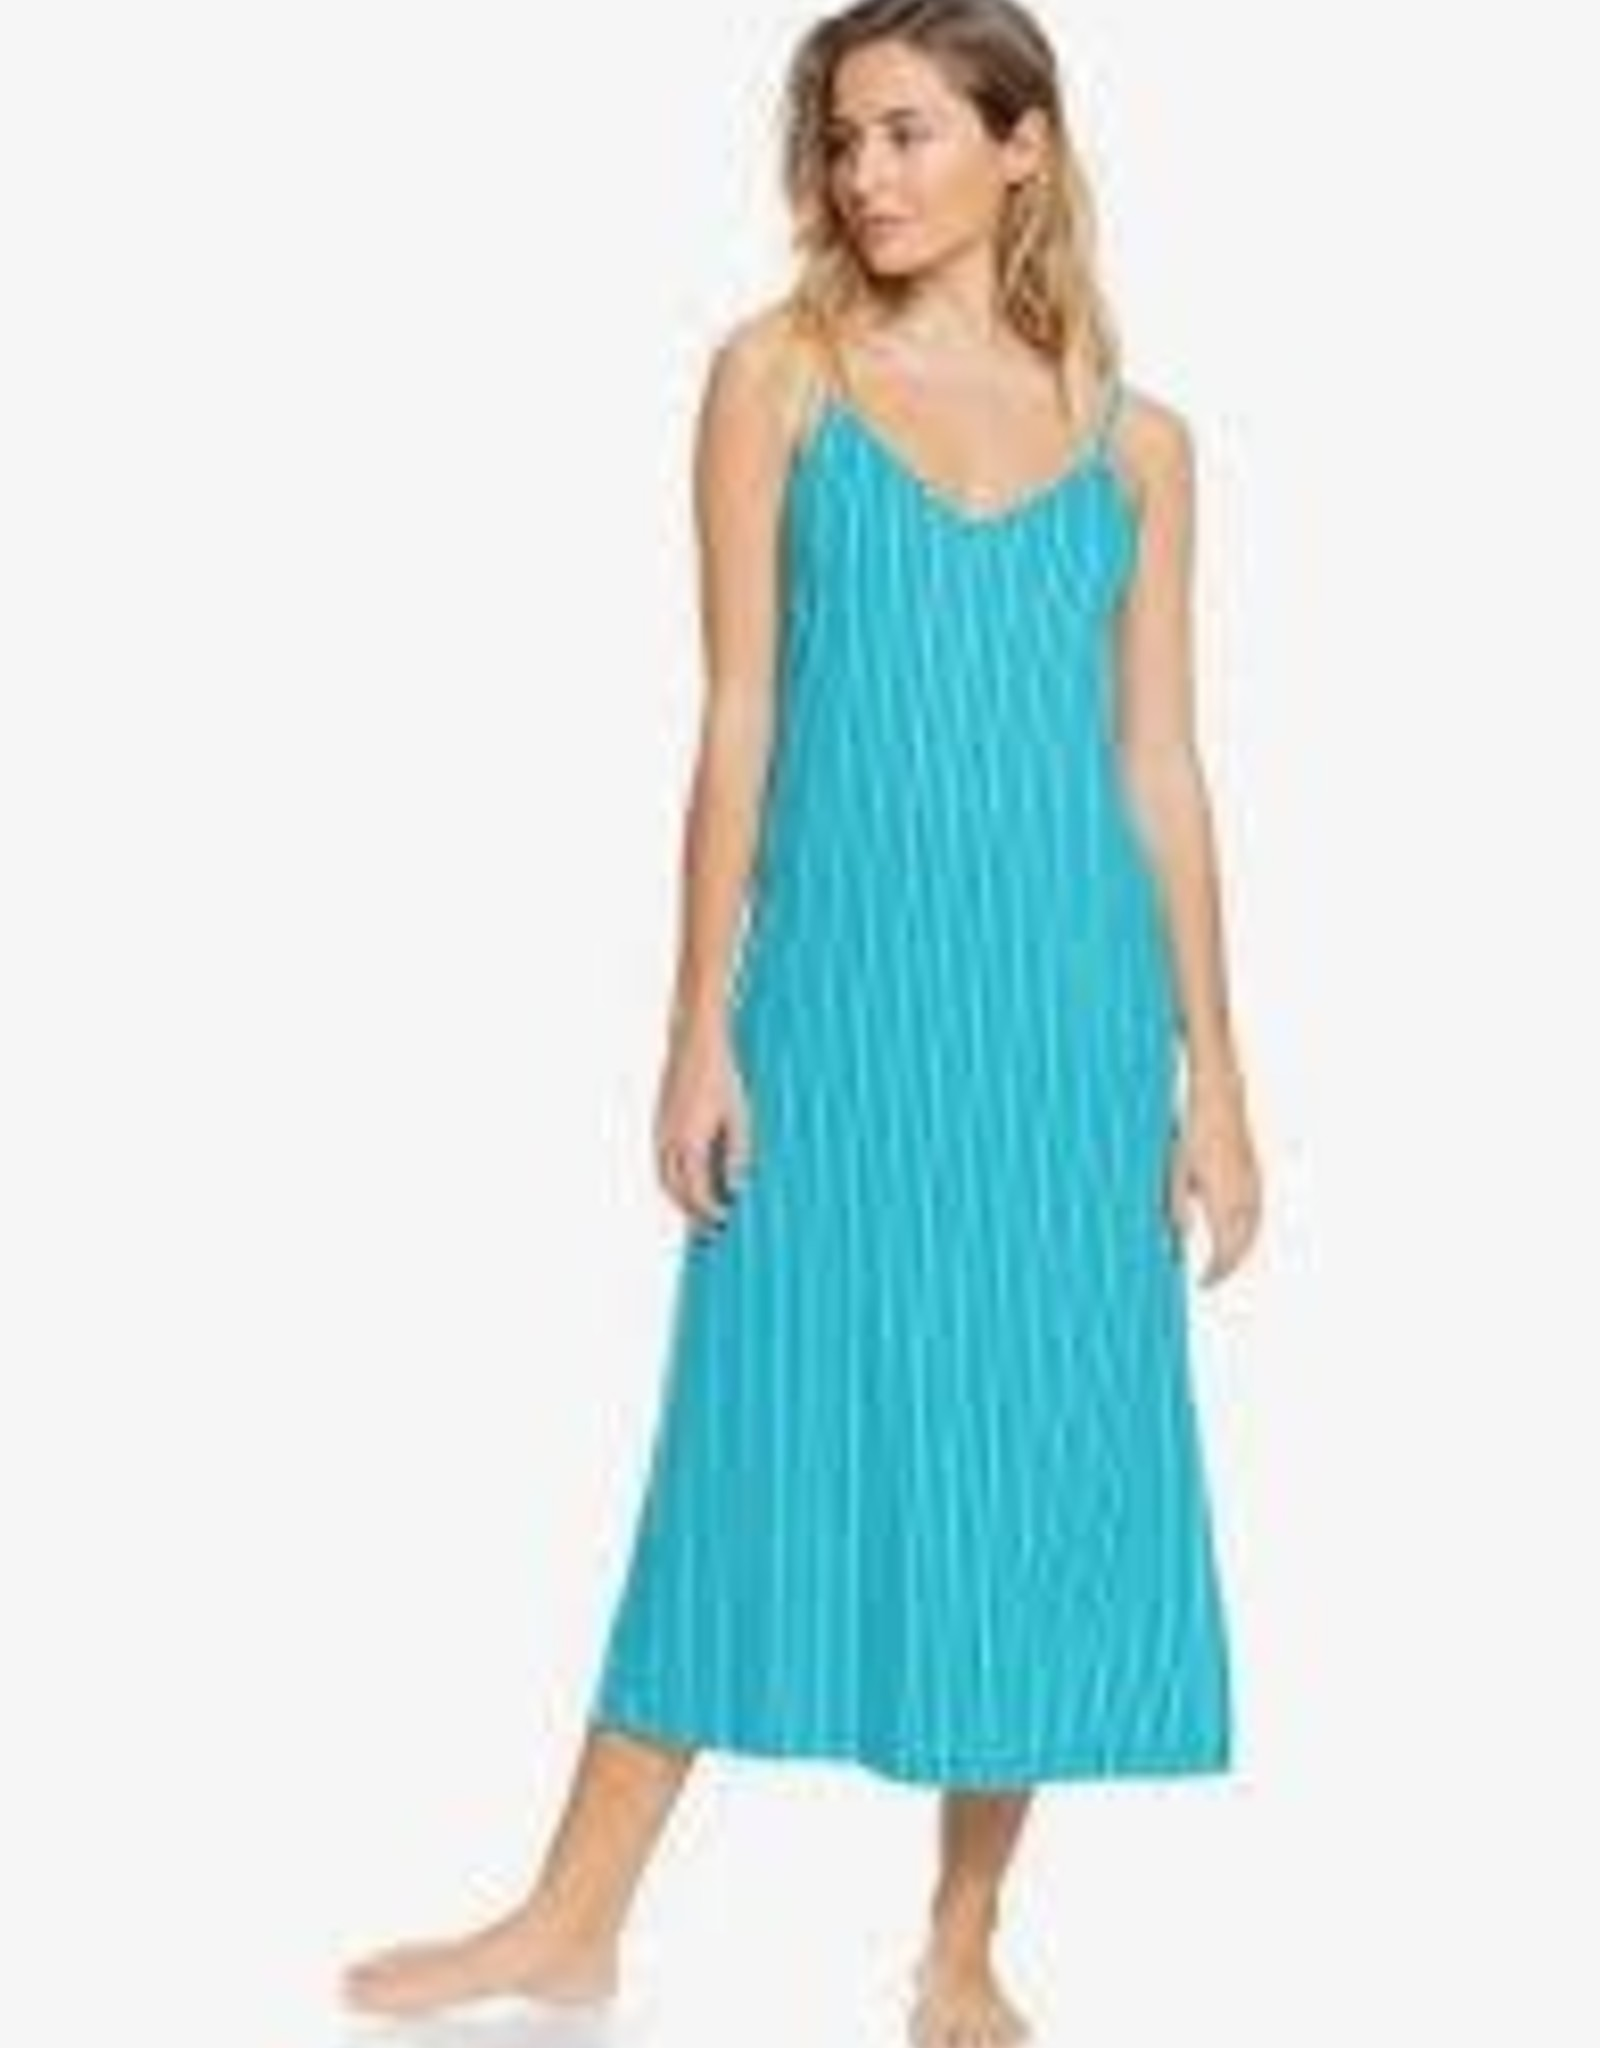 Roxy Roxy Promised Land Striped Midi Dress ERJKD03371